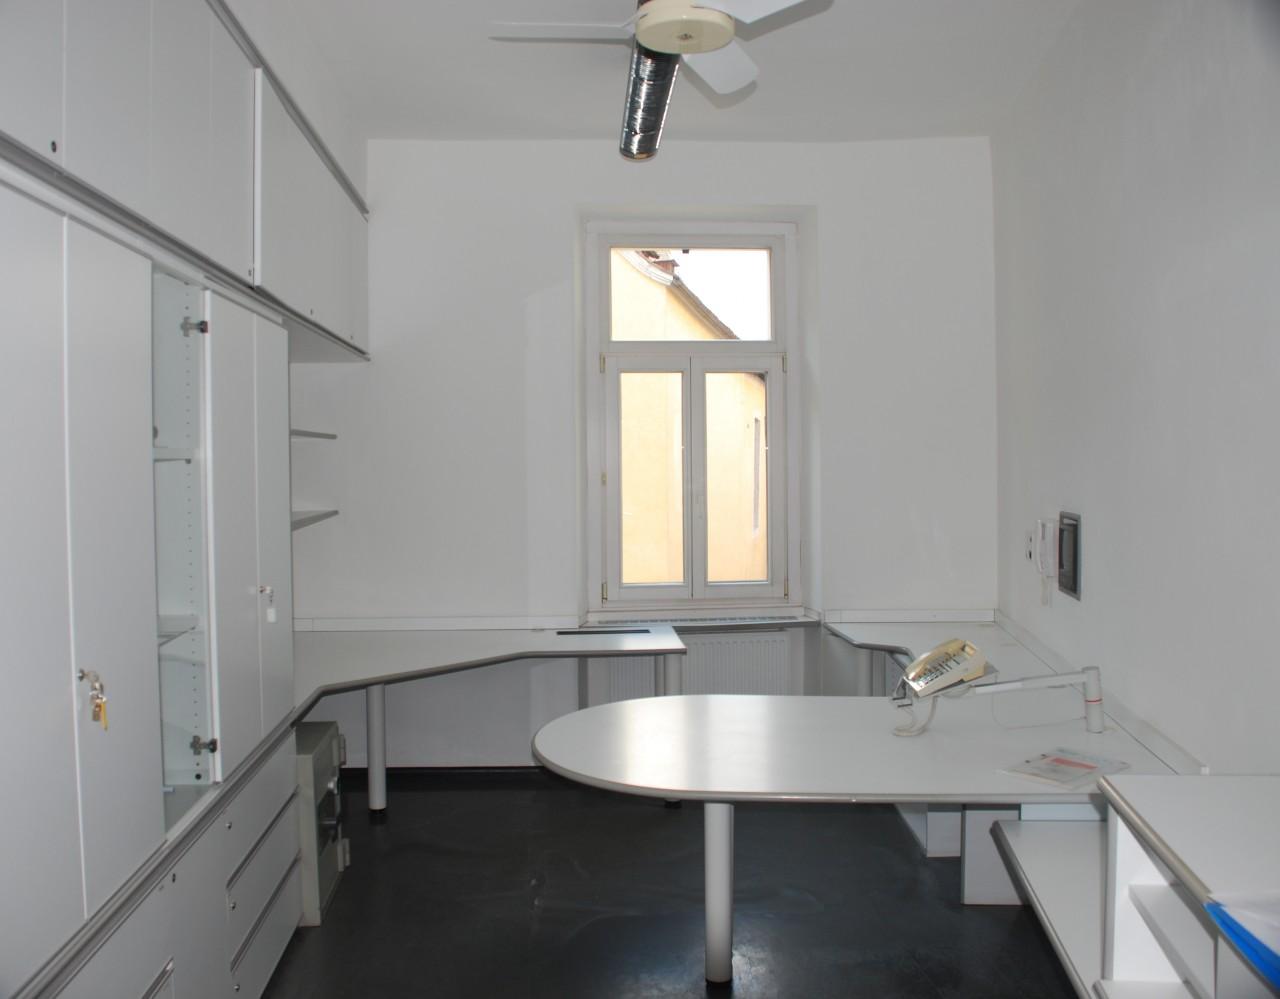 Merano affittasi ampio ufficio - Meran großes Büro zu vermieten